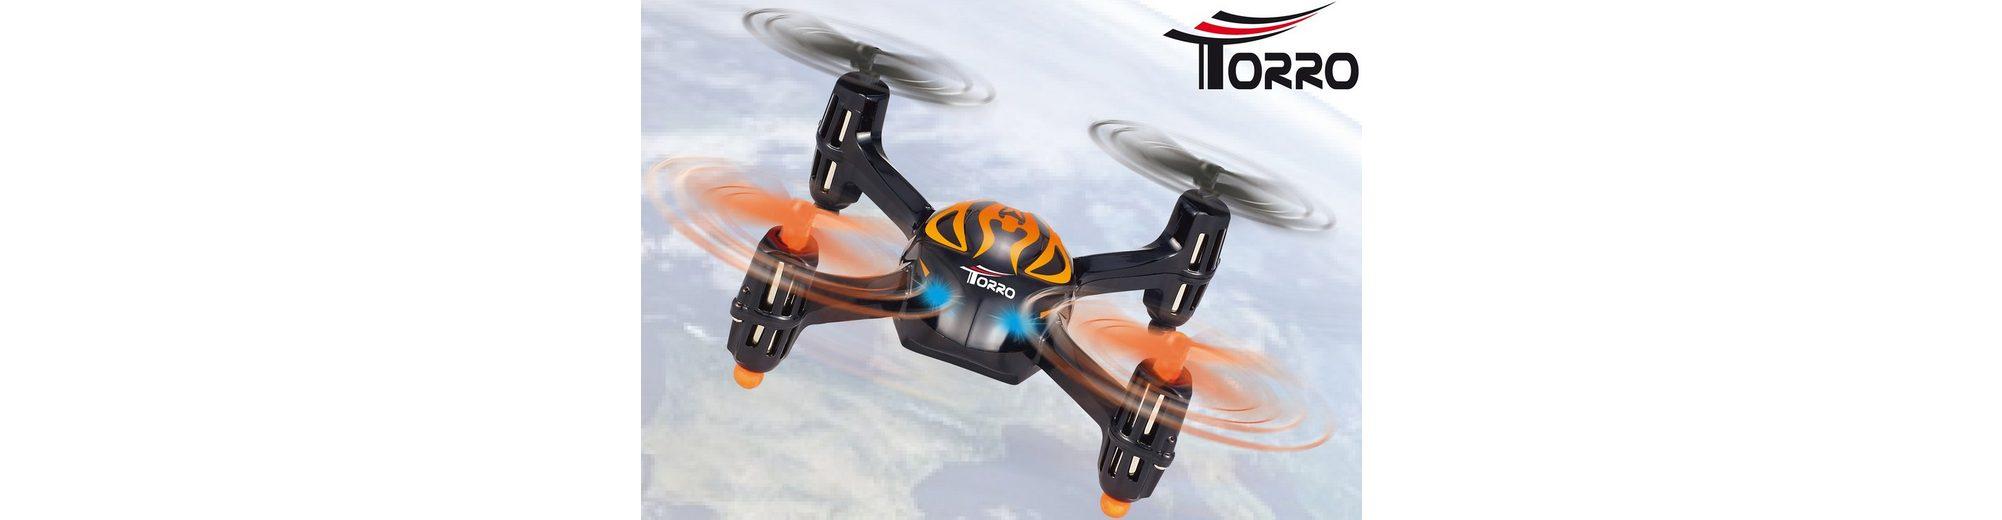 Torro RC-Komplett-Set, »U830 Mini Quadcopter«